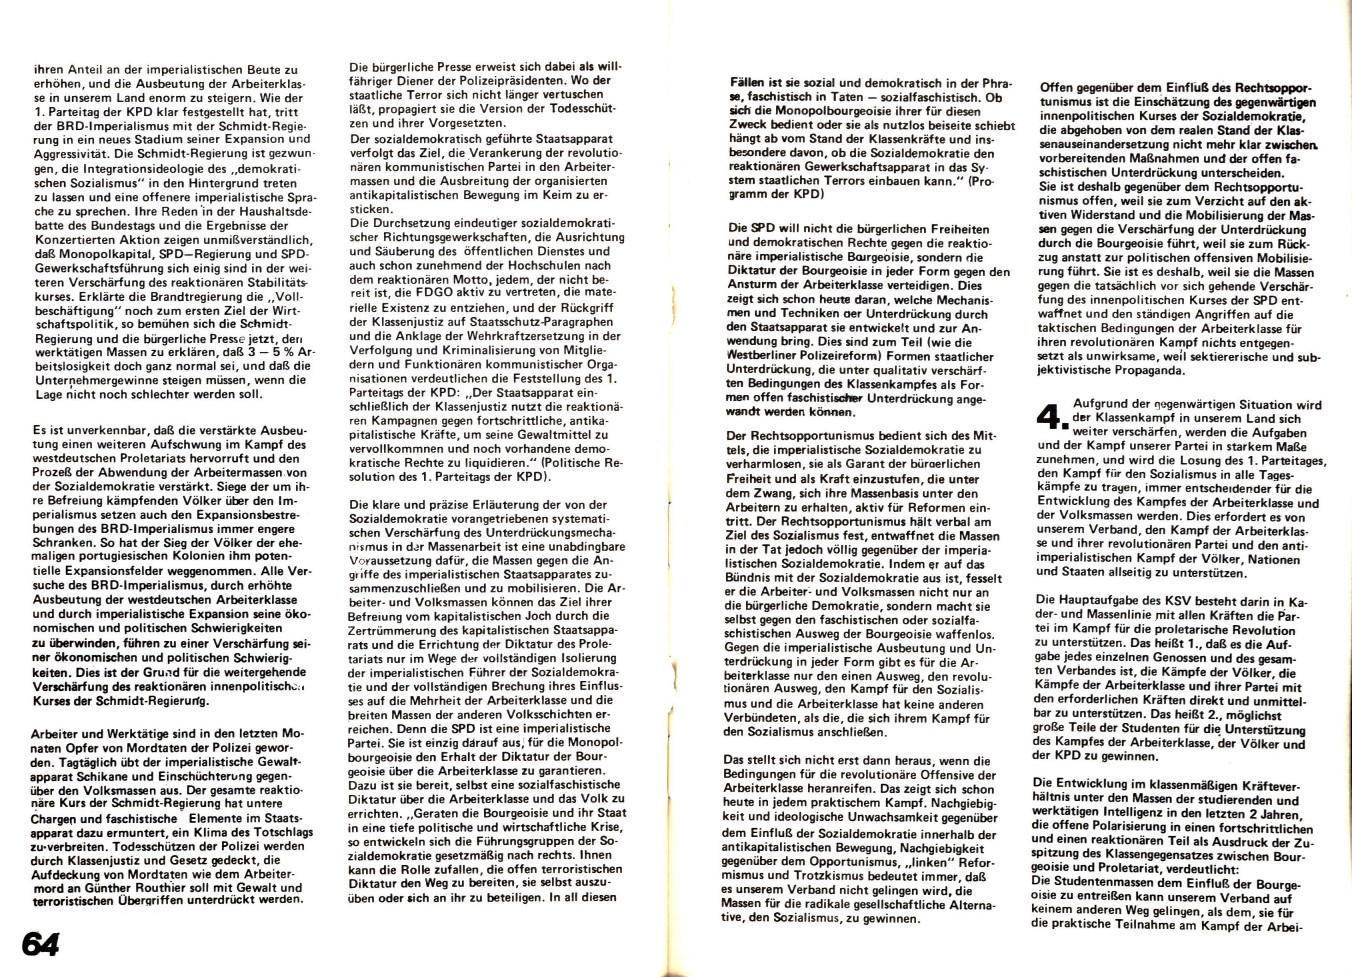 KSV_1974_Rechenschaftsbericht_34